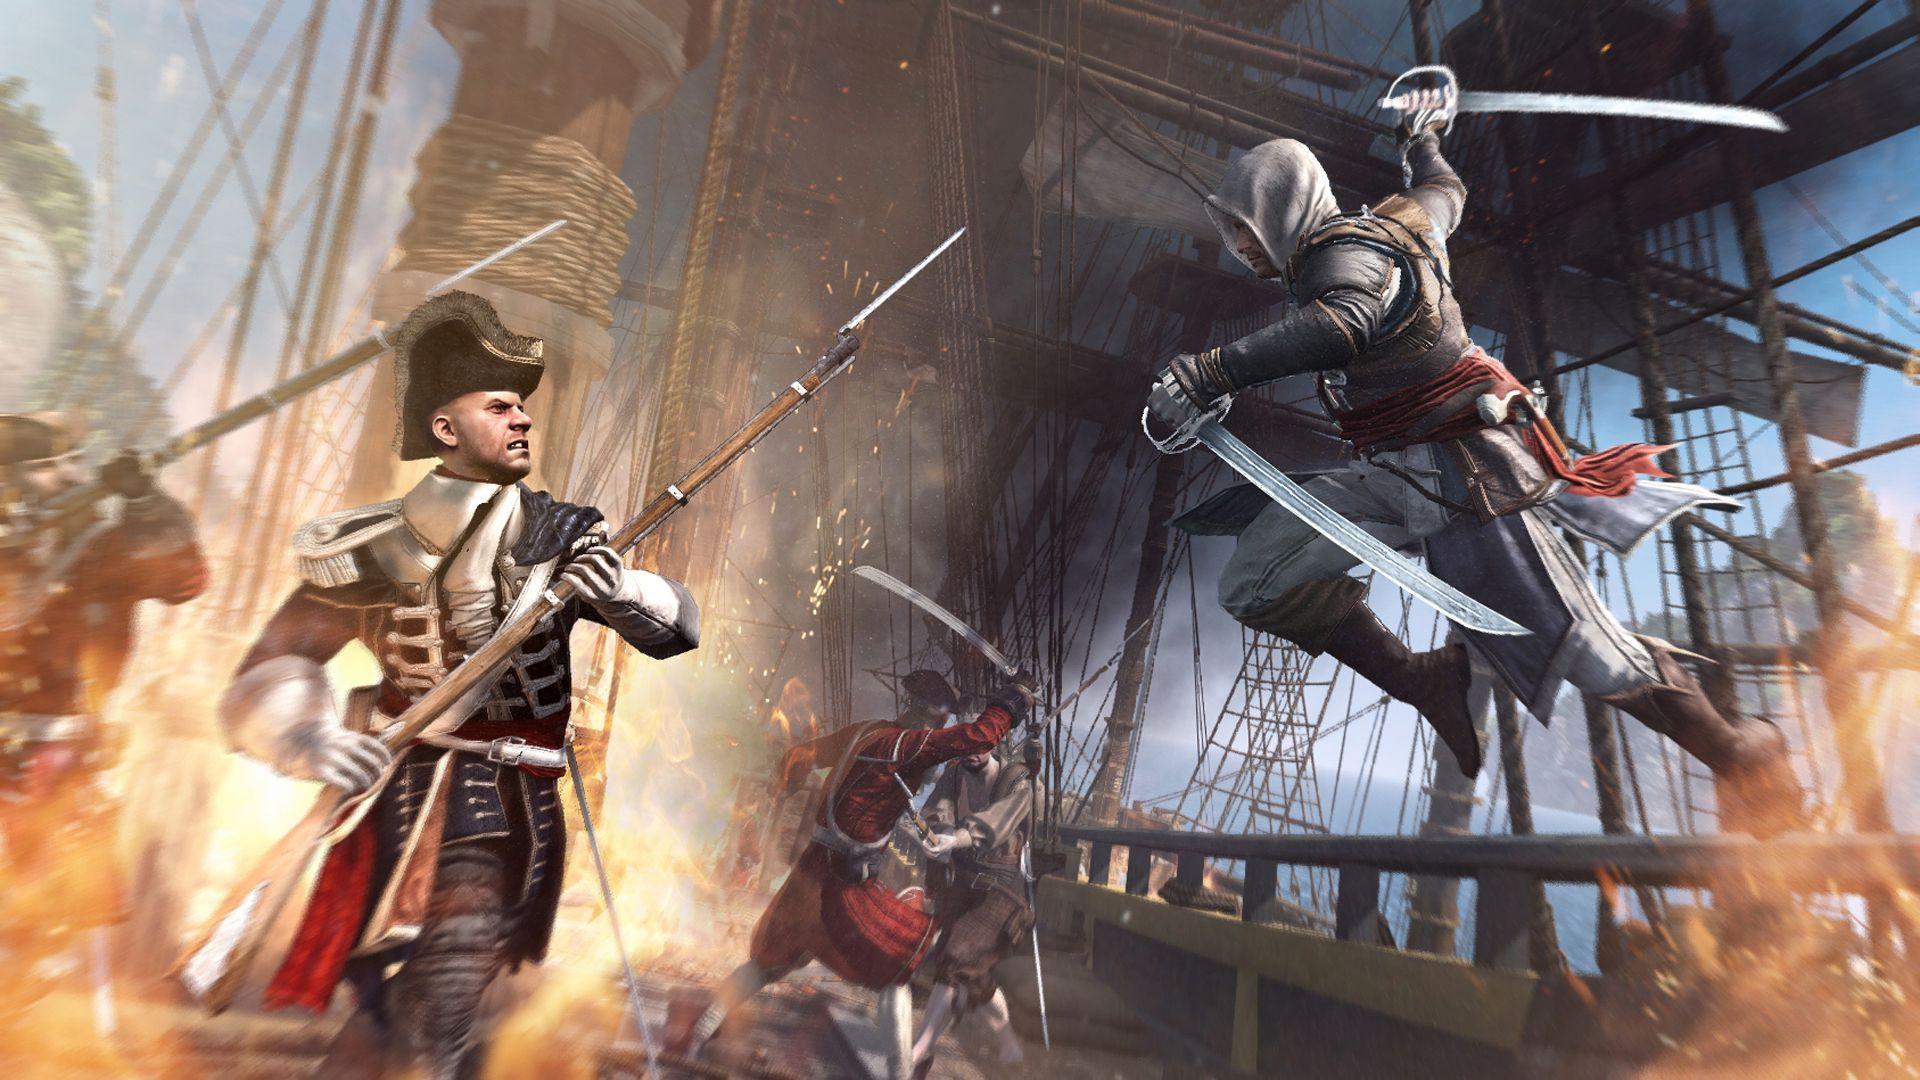 assassin's creed 4 black flag access fleet cracked